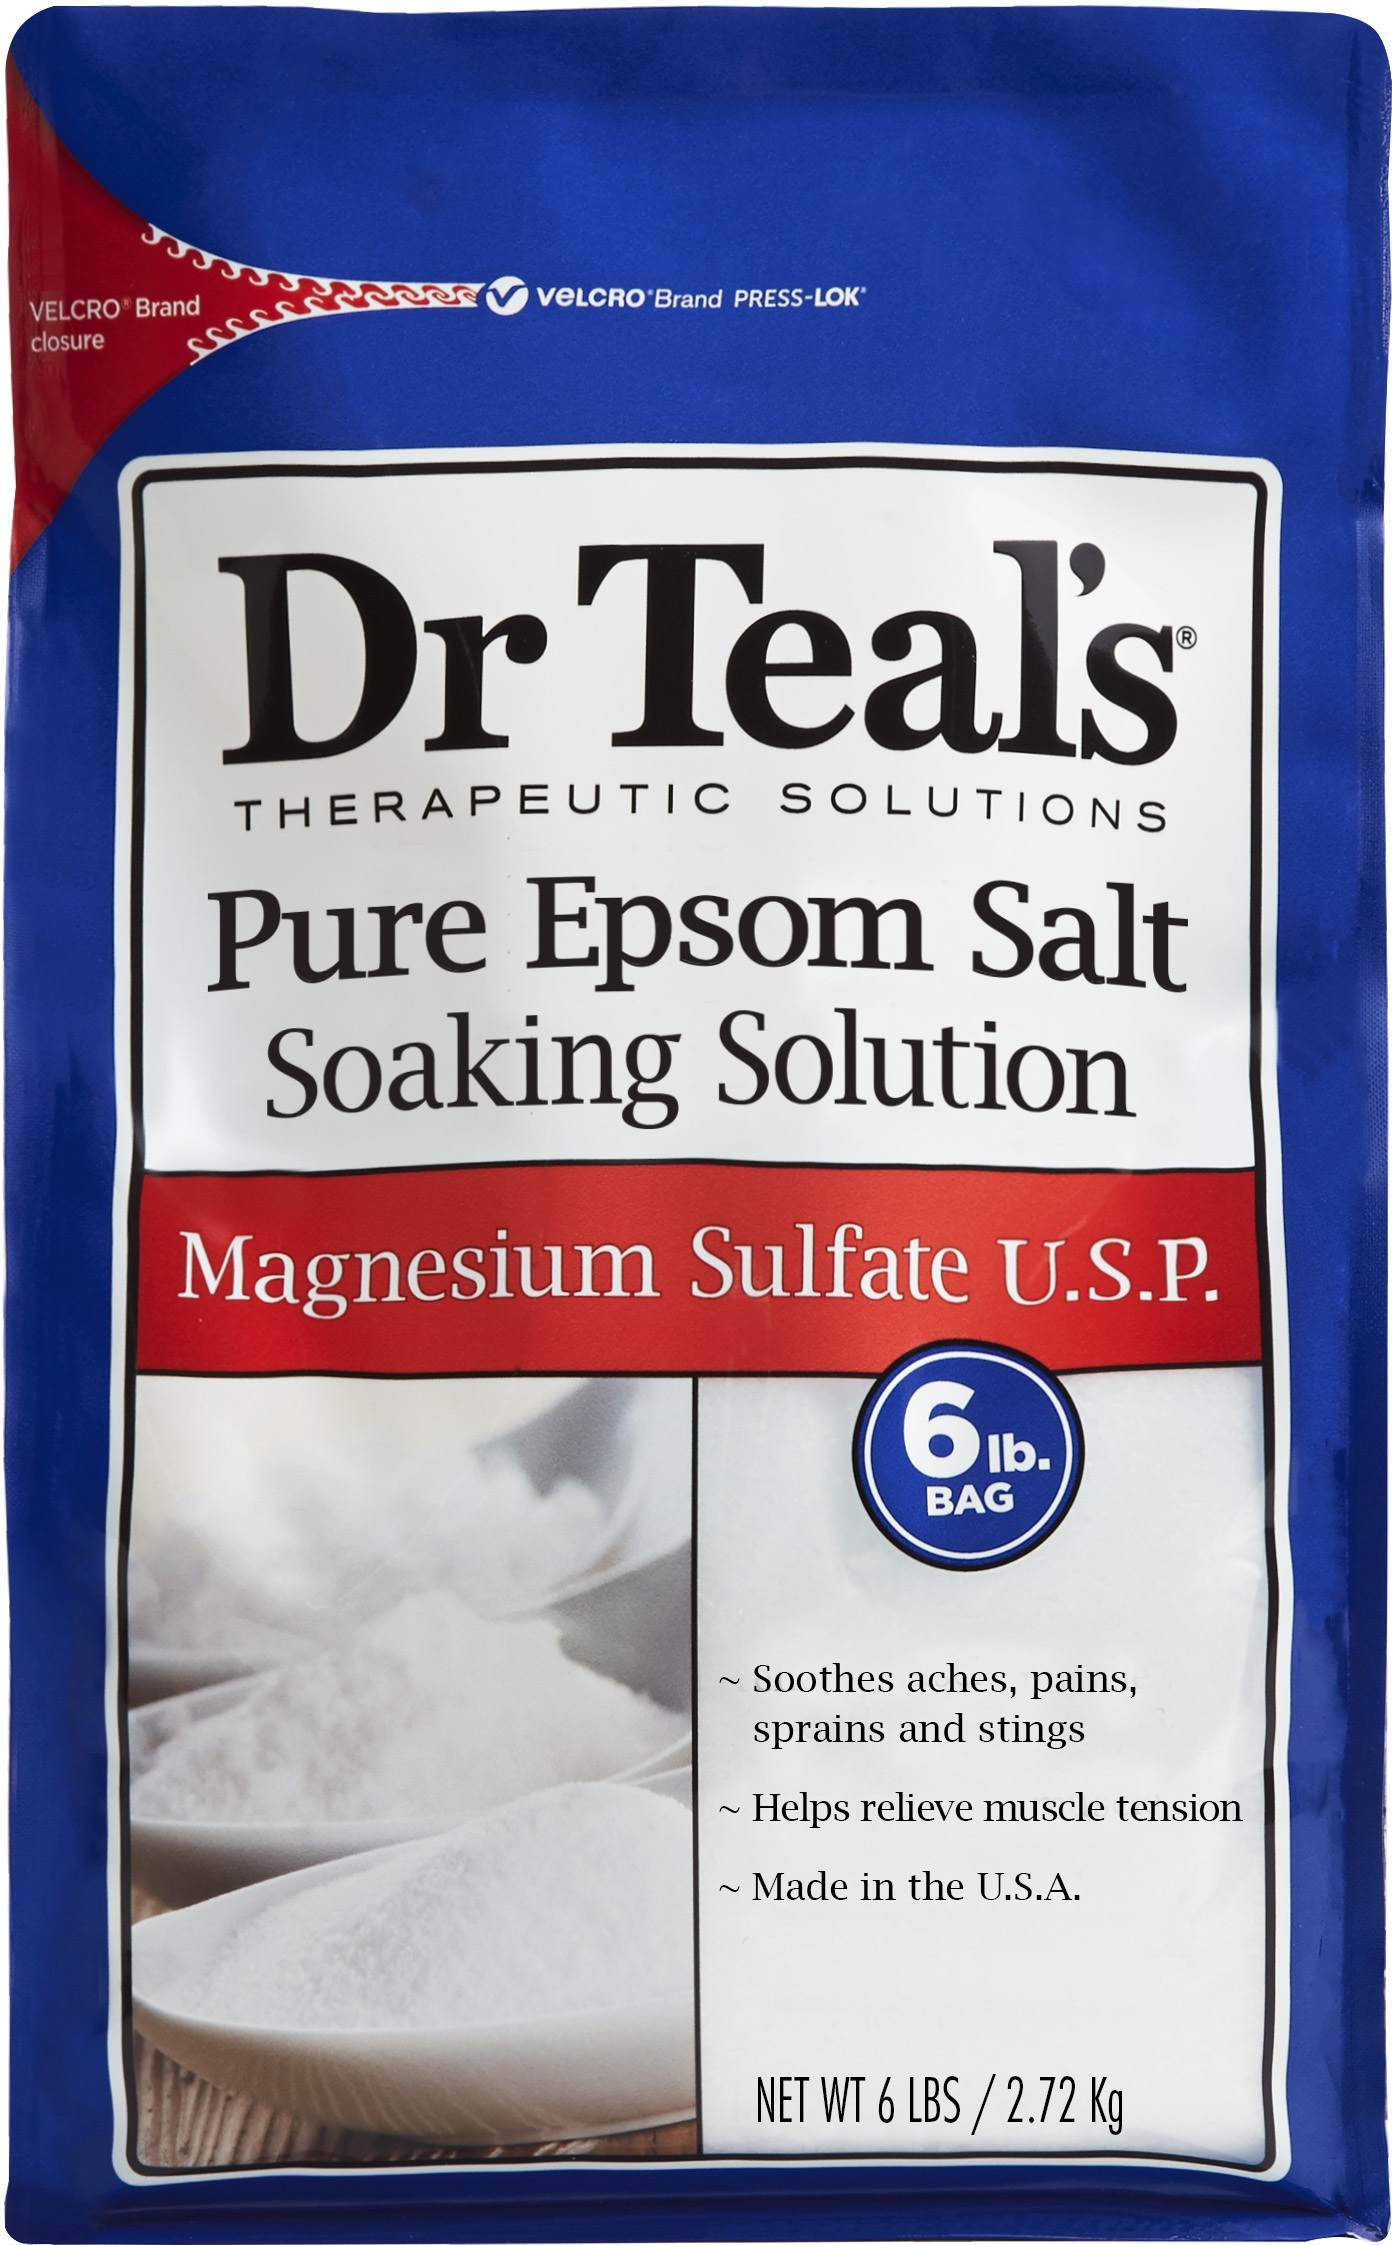 Dr.Teal's® Pure Epsom Salt Magnesium Sulfate U.S.P. Soaking Solution